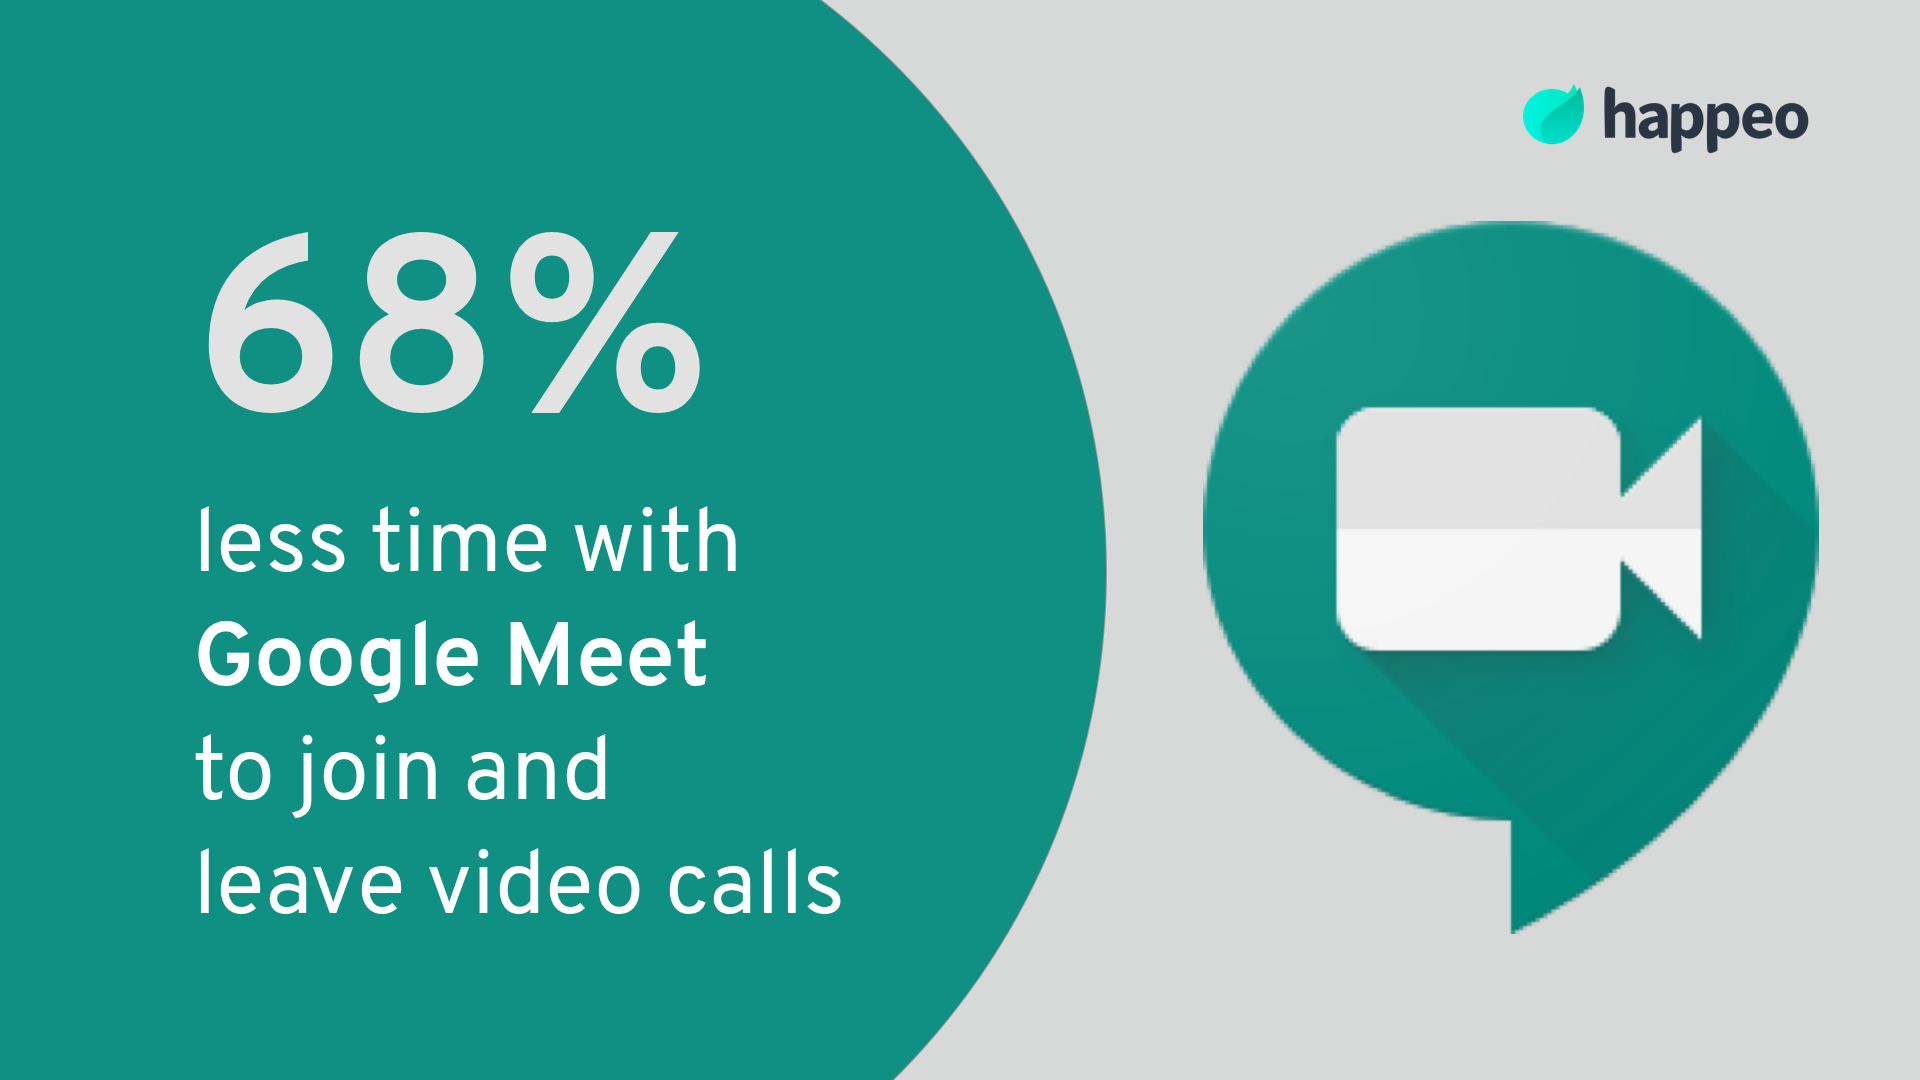 Google Meet advantages